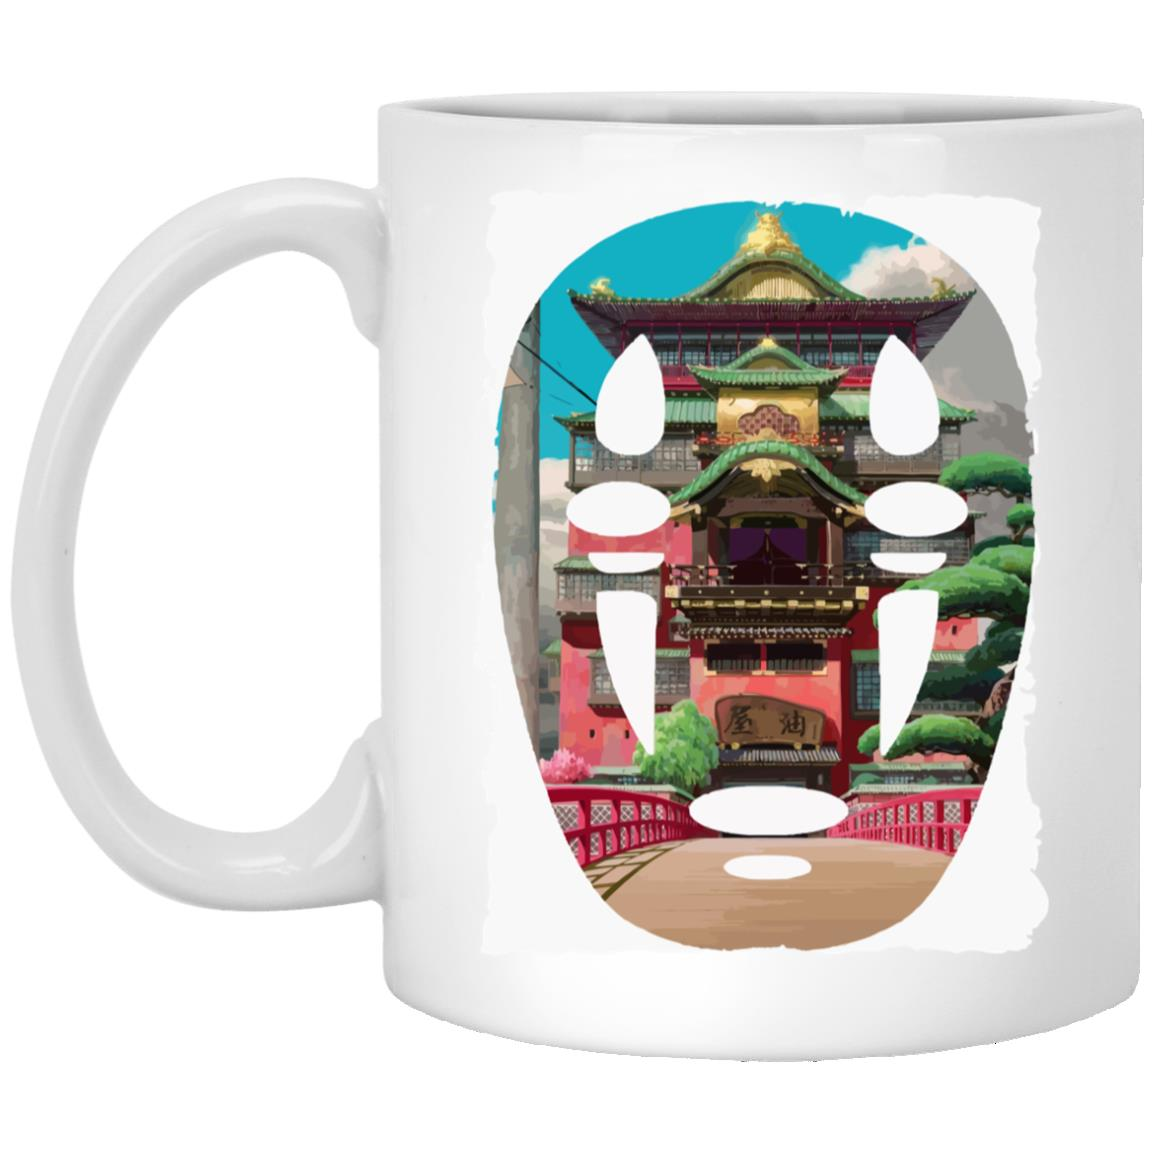 Spirited Away –  The Bathhouse Ft. No Face Mug